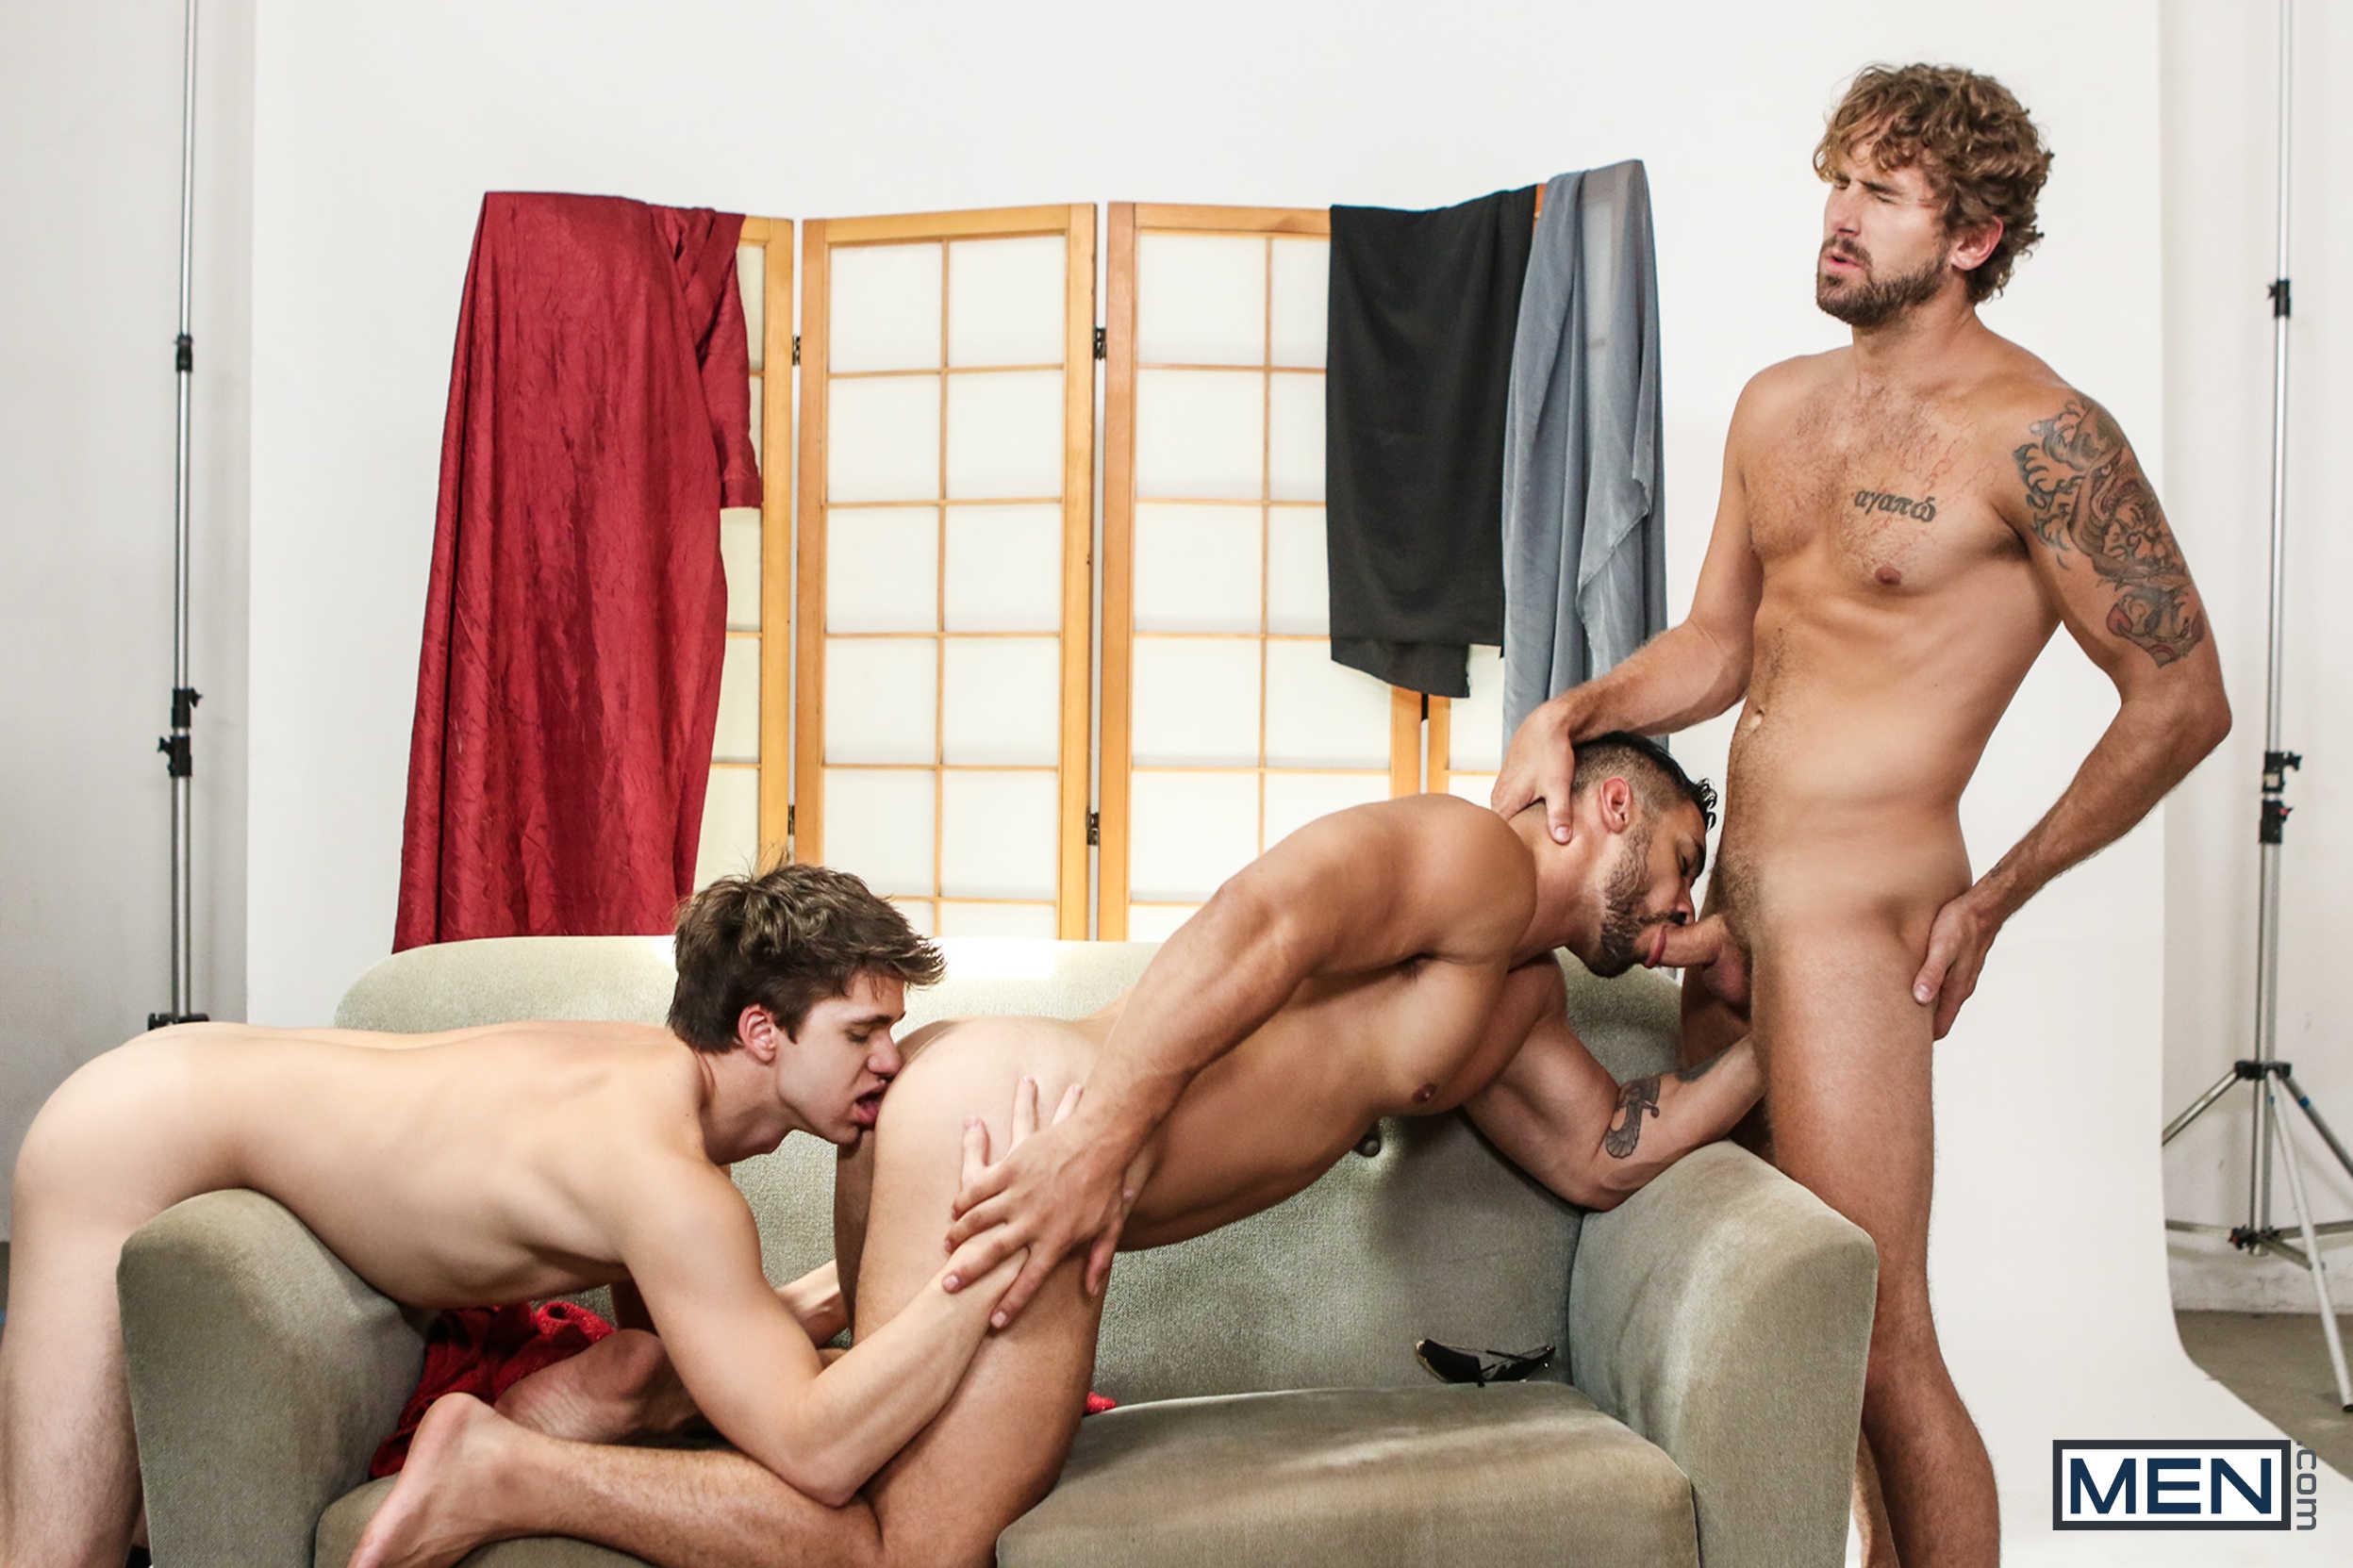 Arad Winwin Porn Videos Bareback arad winwin gay porn hairy tales part 2 – x private club